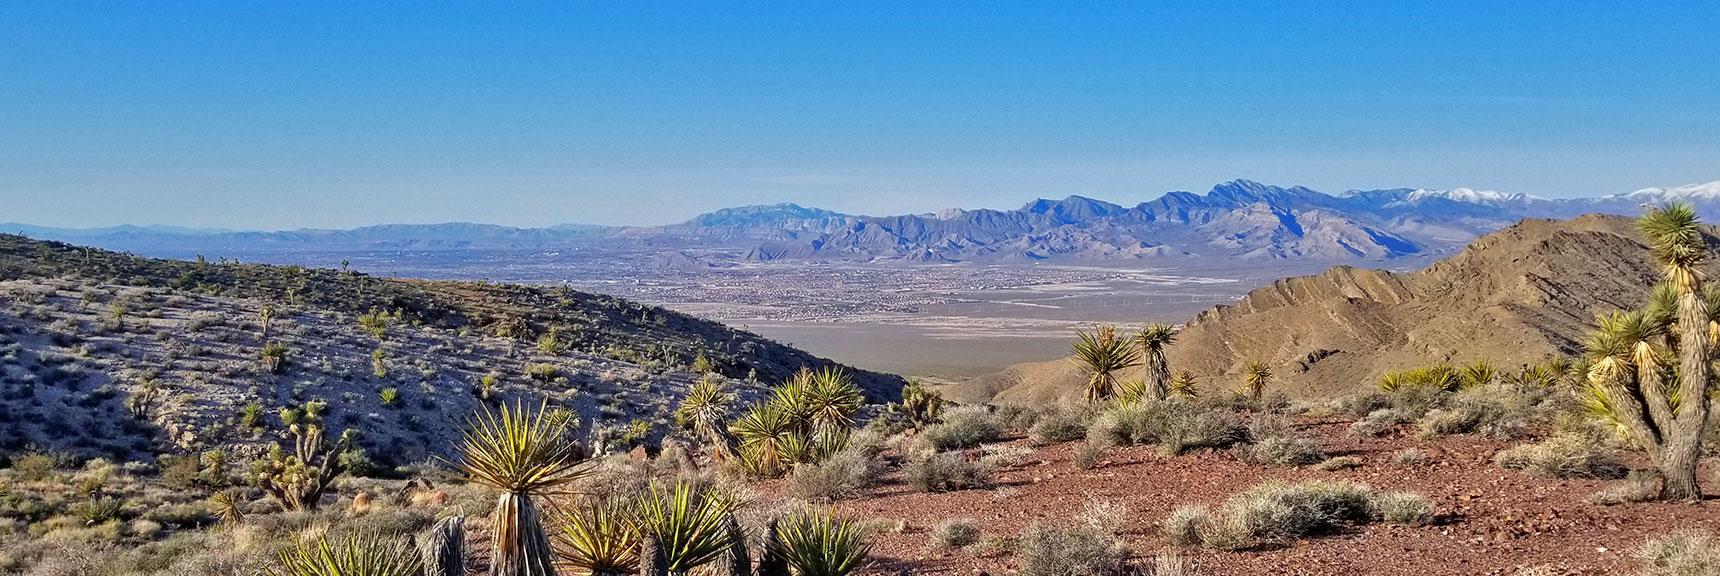 Looking Back Through the Castle Rock/Gass Peak Pass Toward Northern Las Vegas and the La Madre Mountains Wilderness | Gass Peak Eastern Summit Ultra-marathon Adventure, Nevada